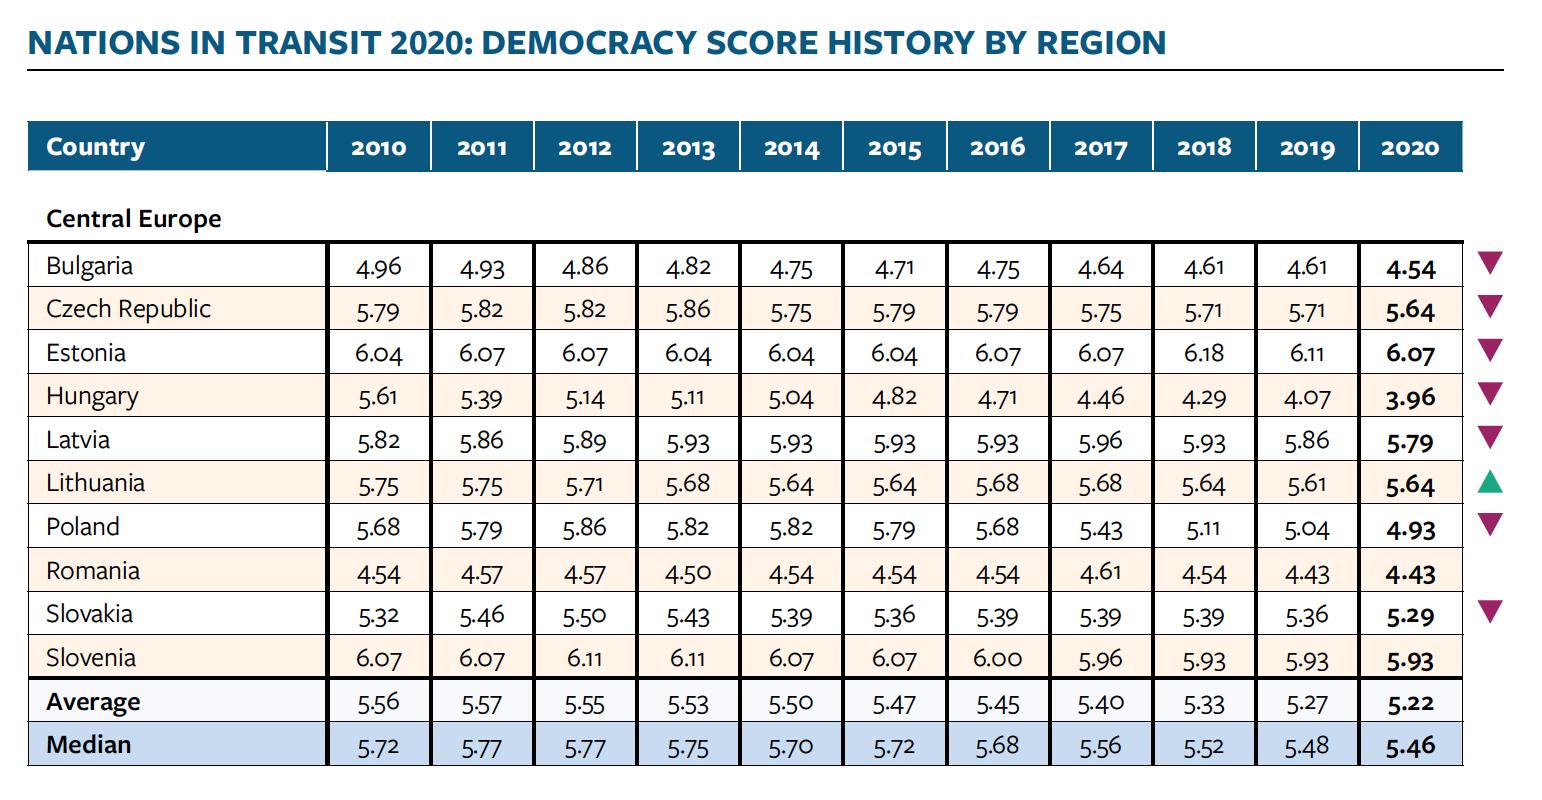 https://oko.press/images/2020/05/NiT-Europa-S%CC%81rodkowa-wyniki-2010-2020.png